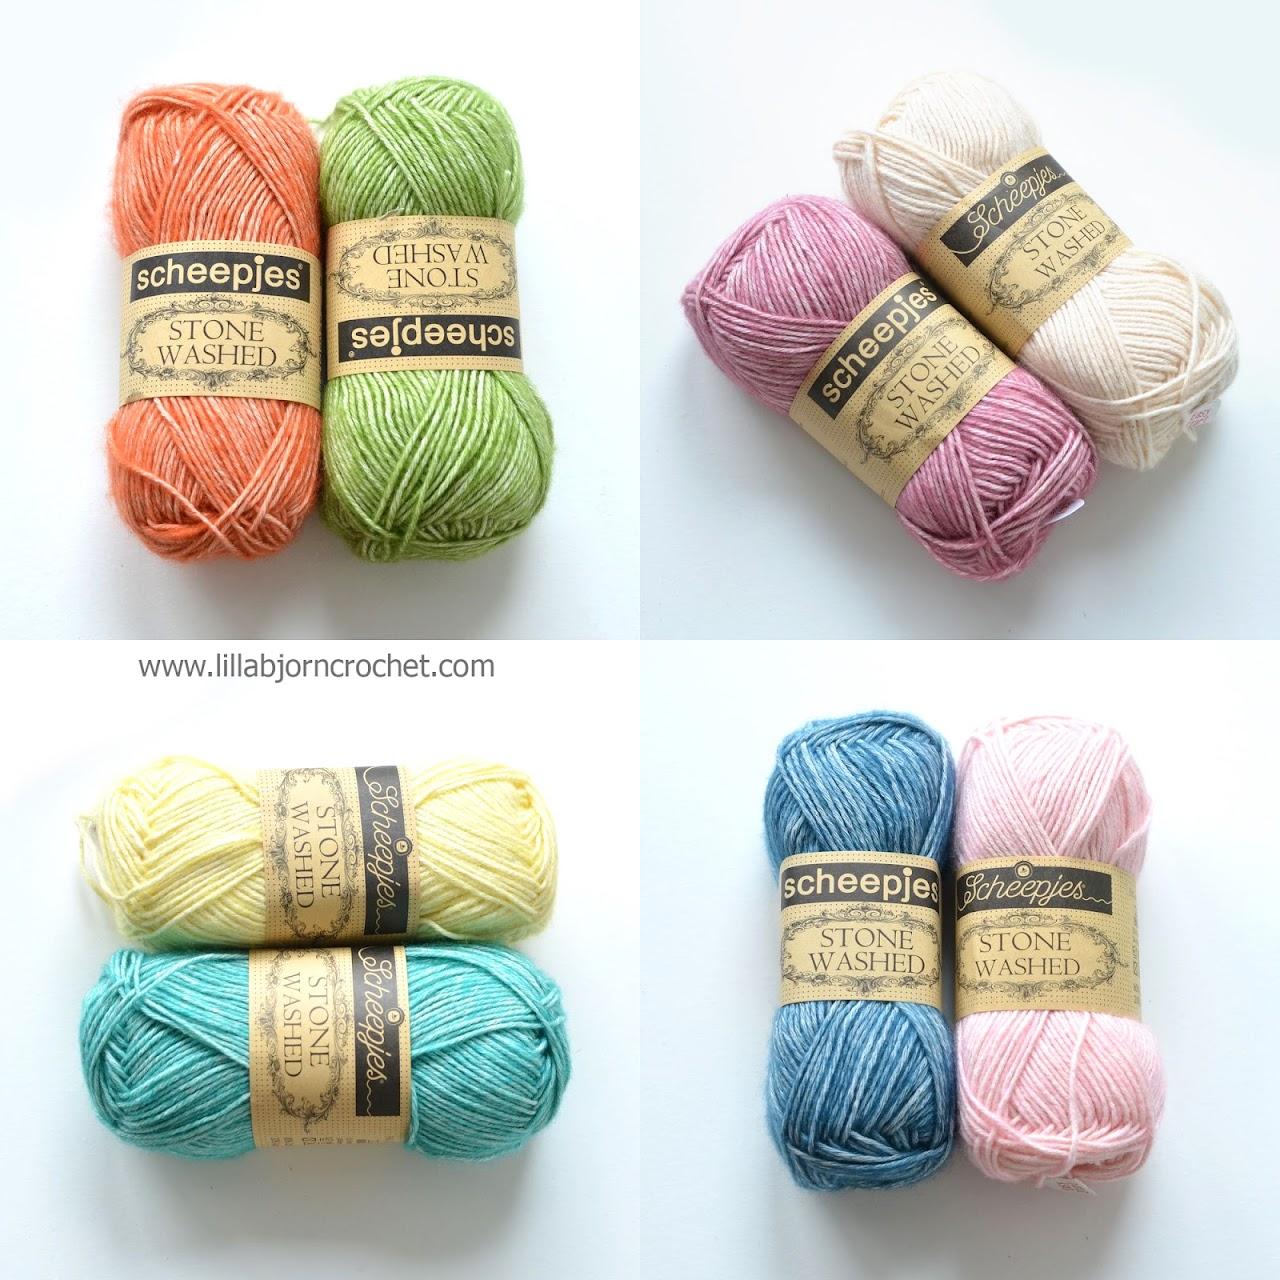 Stone Washed yarn by Scheepjes